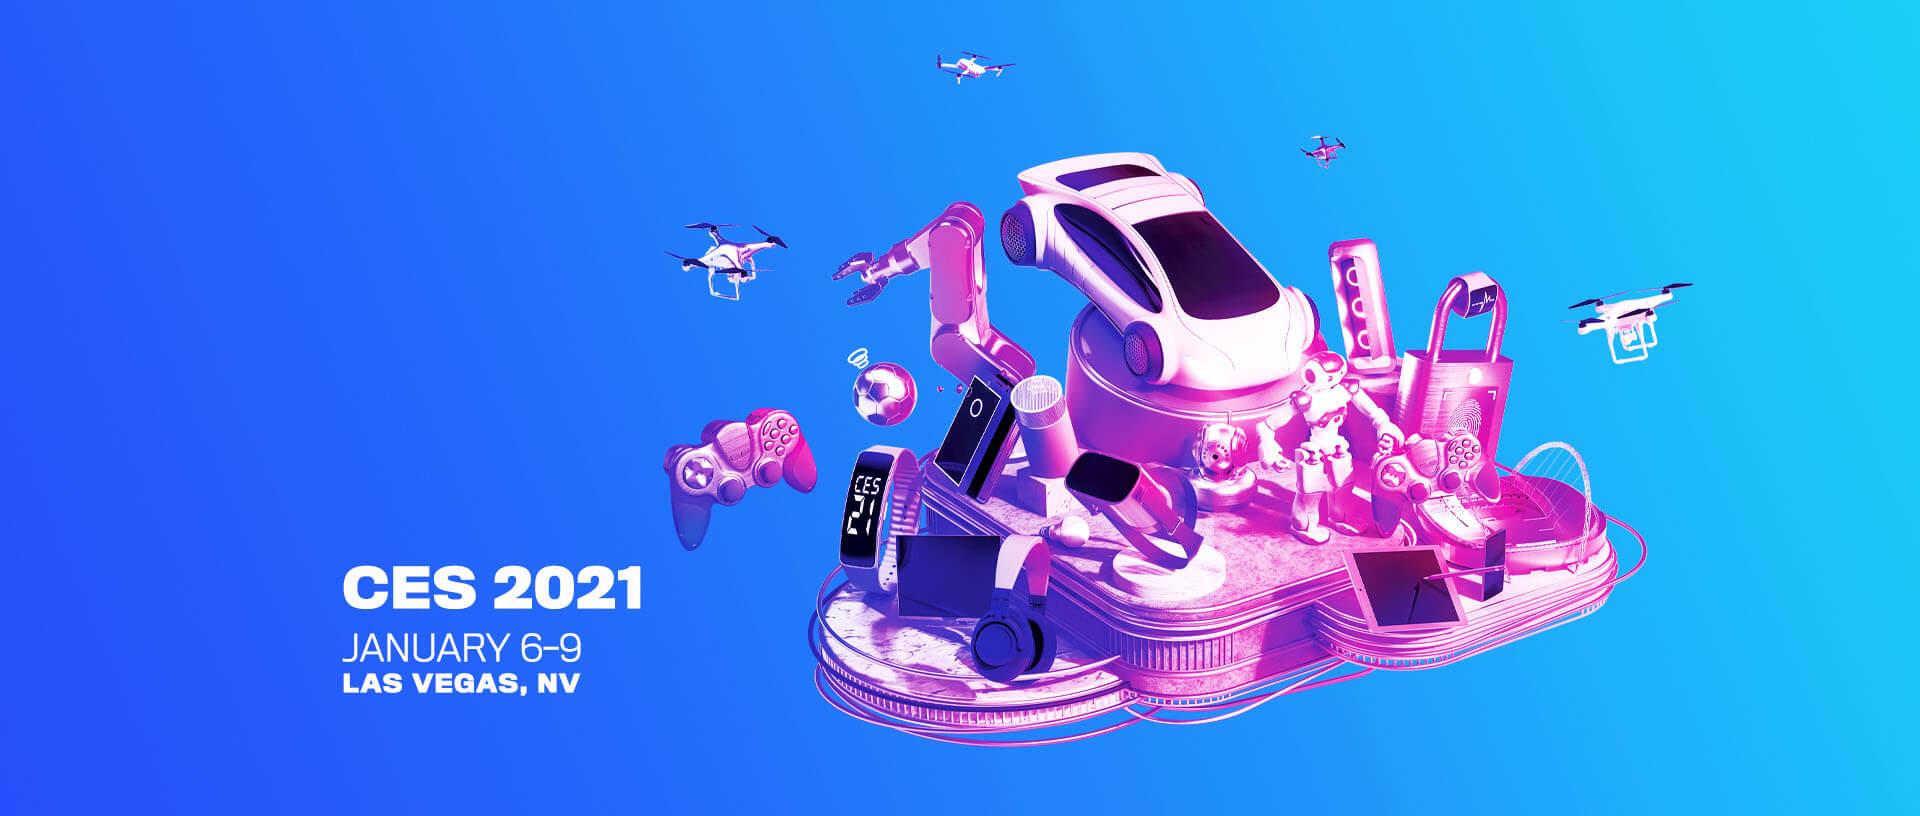 ces 2021 event las vegas january 2021